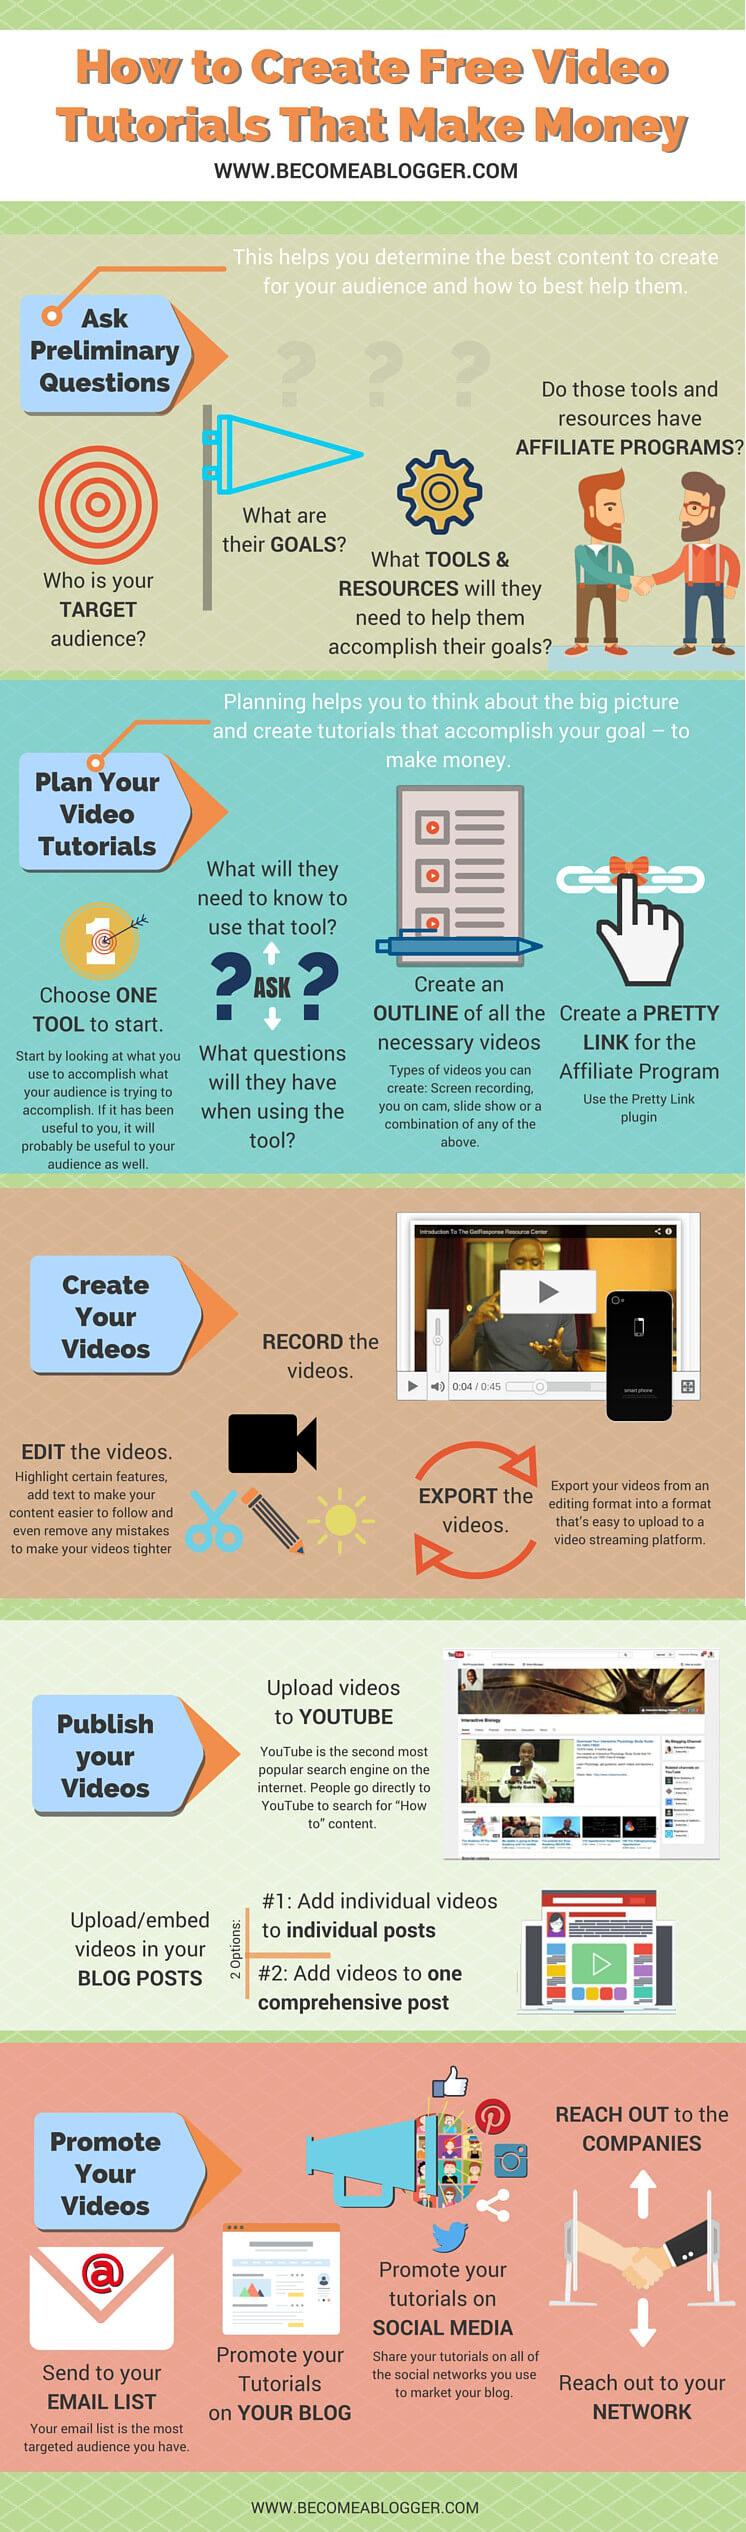 252_Video Tutorials_Infographic (1)